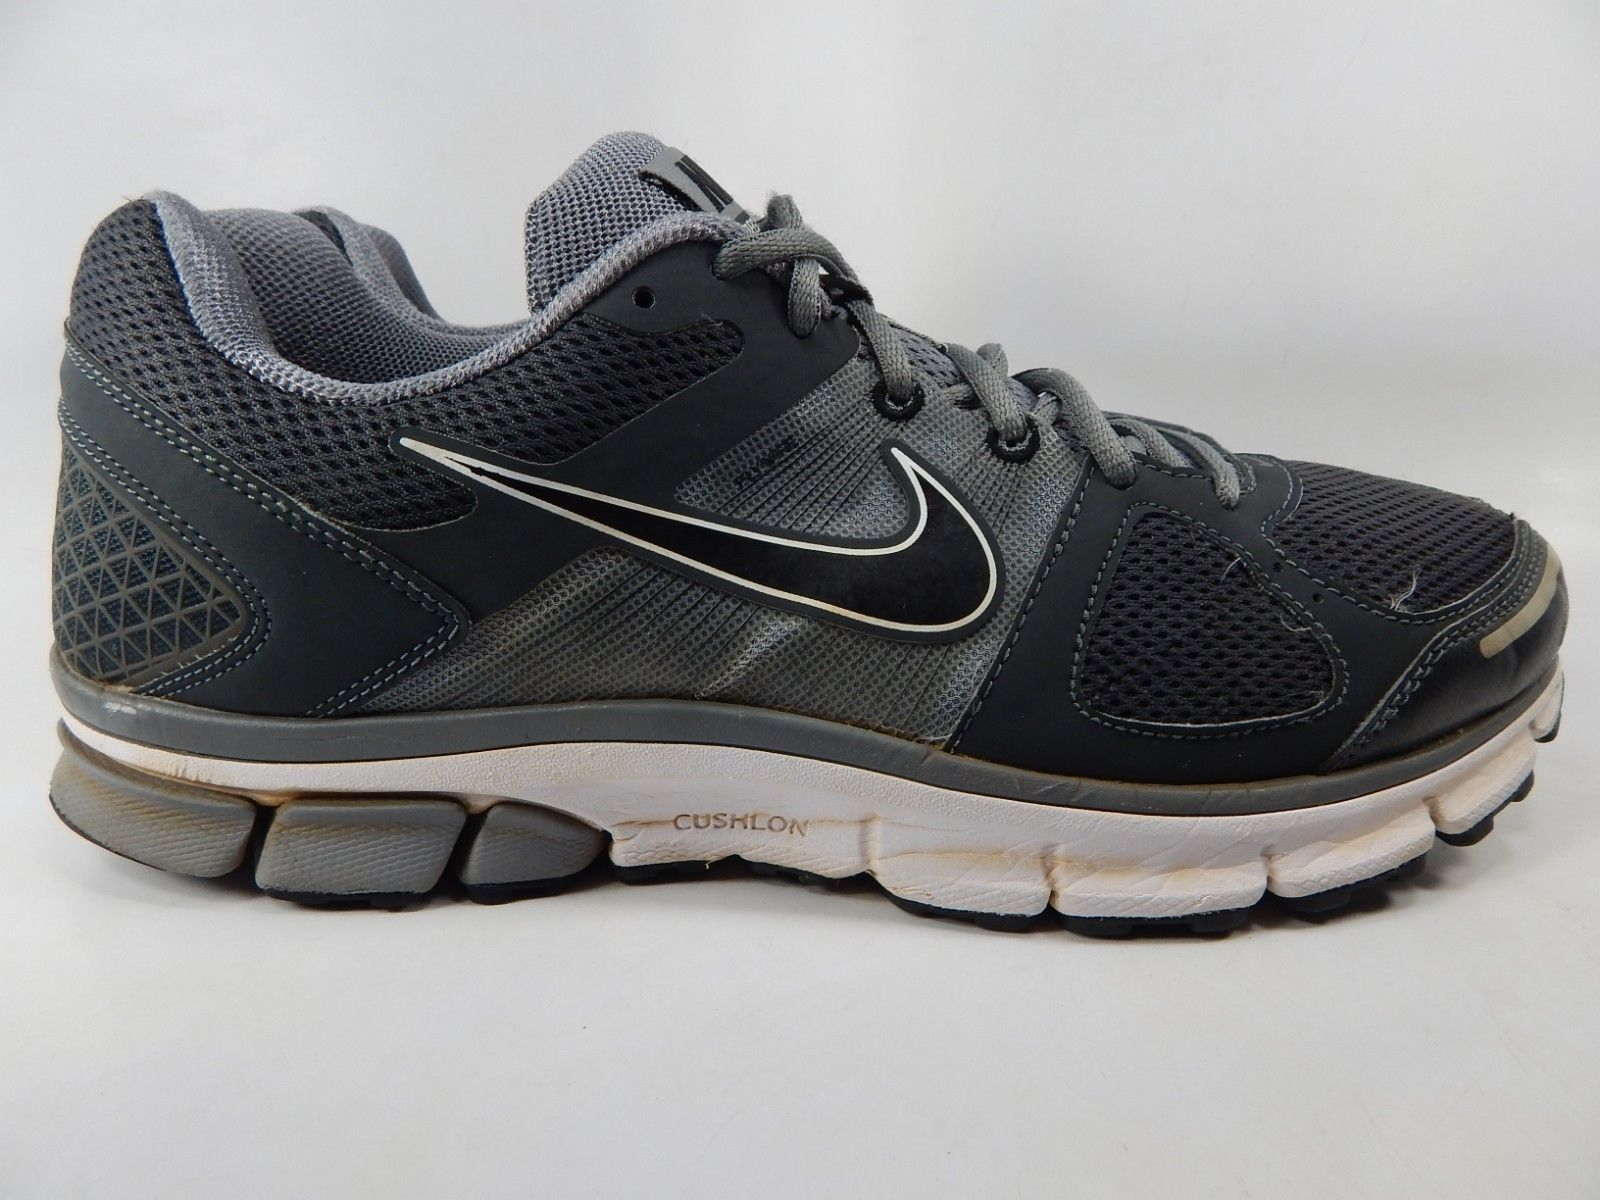 82d1e0608348a 57. 57. Previous. Nike Air Pegasus+ 28 Size 13 M (D) EU 47.5 Men s Running  Shoes Gray · Nike Air Pegasus+ ...